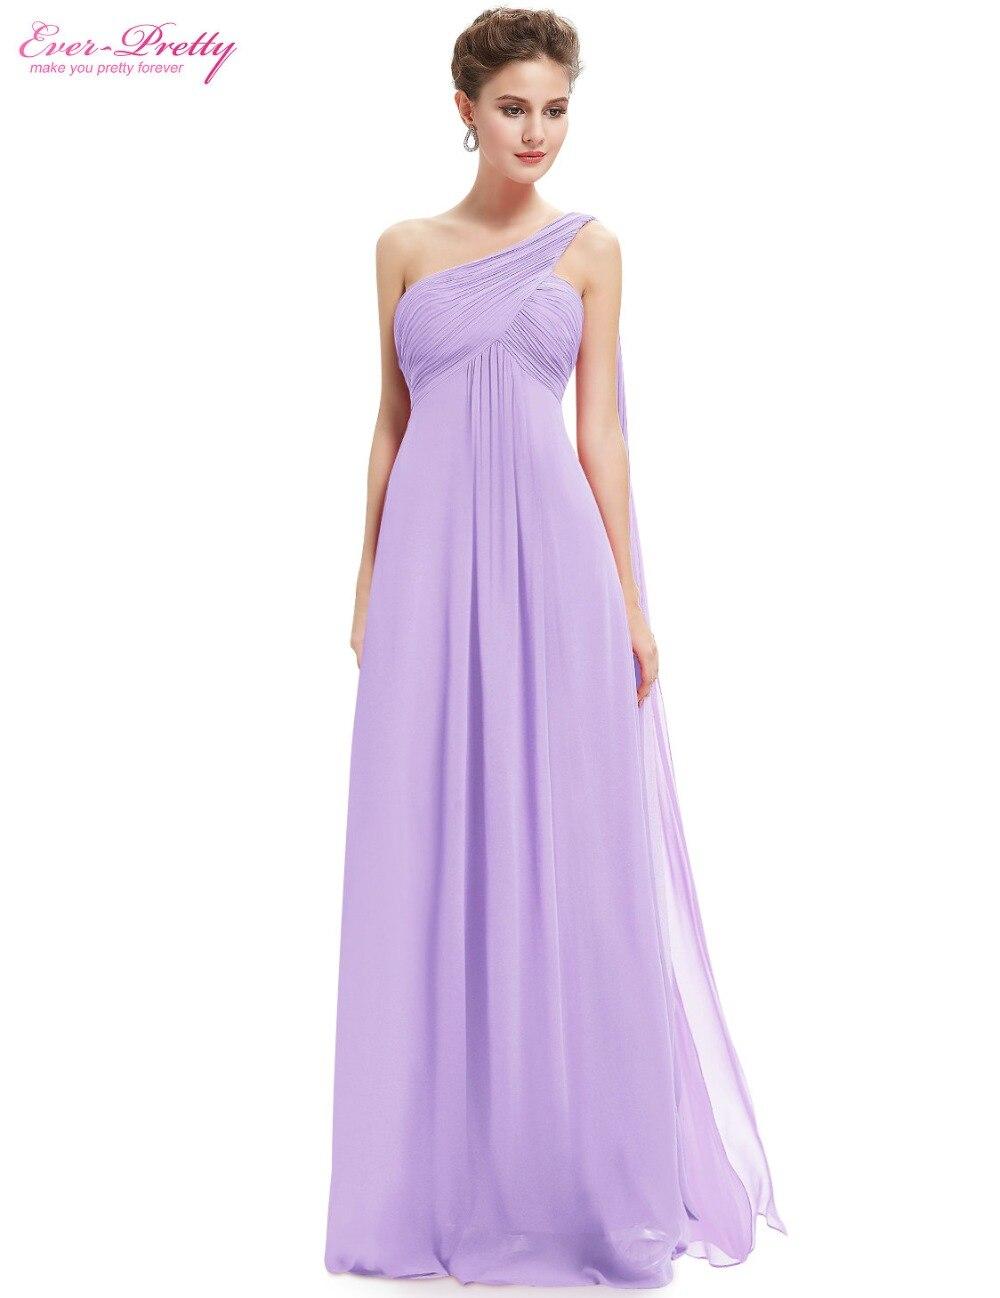 Asombroso Vestidos De Dama De Largo Verde Azulado Cresta - Ideas de ...